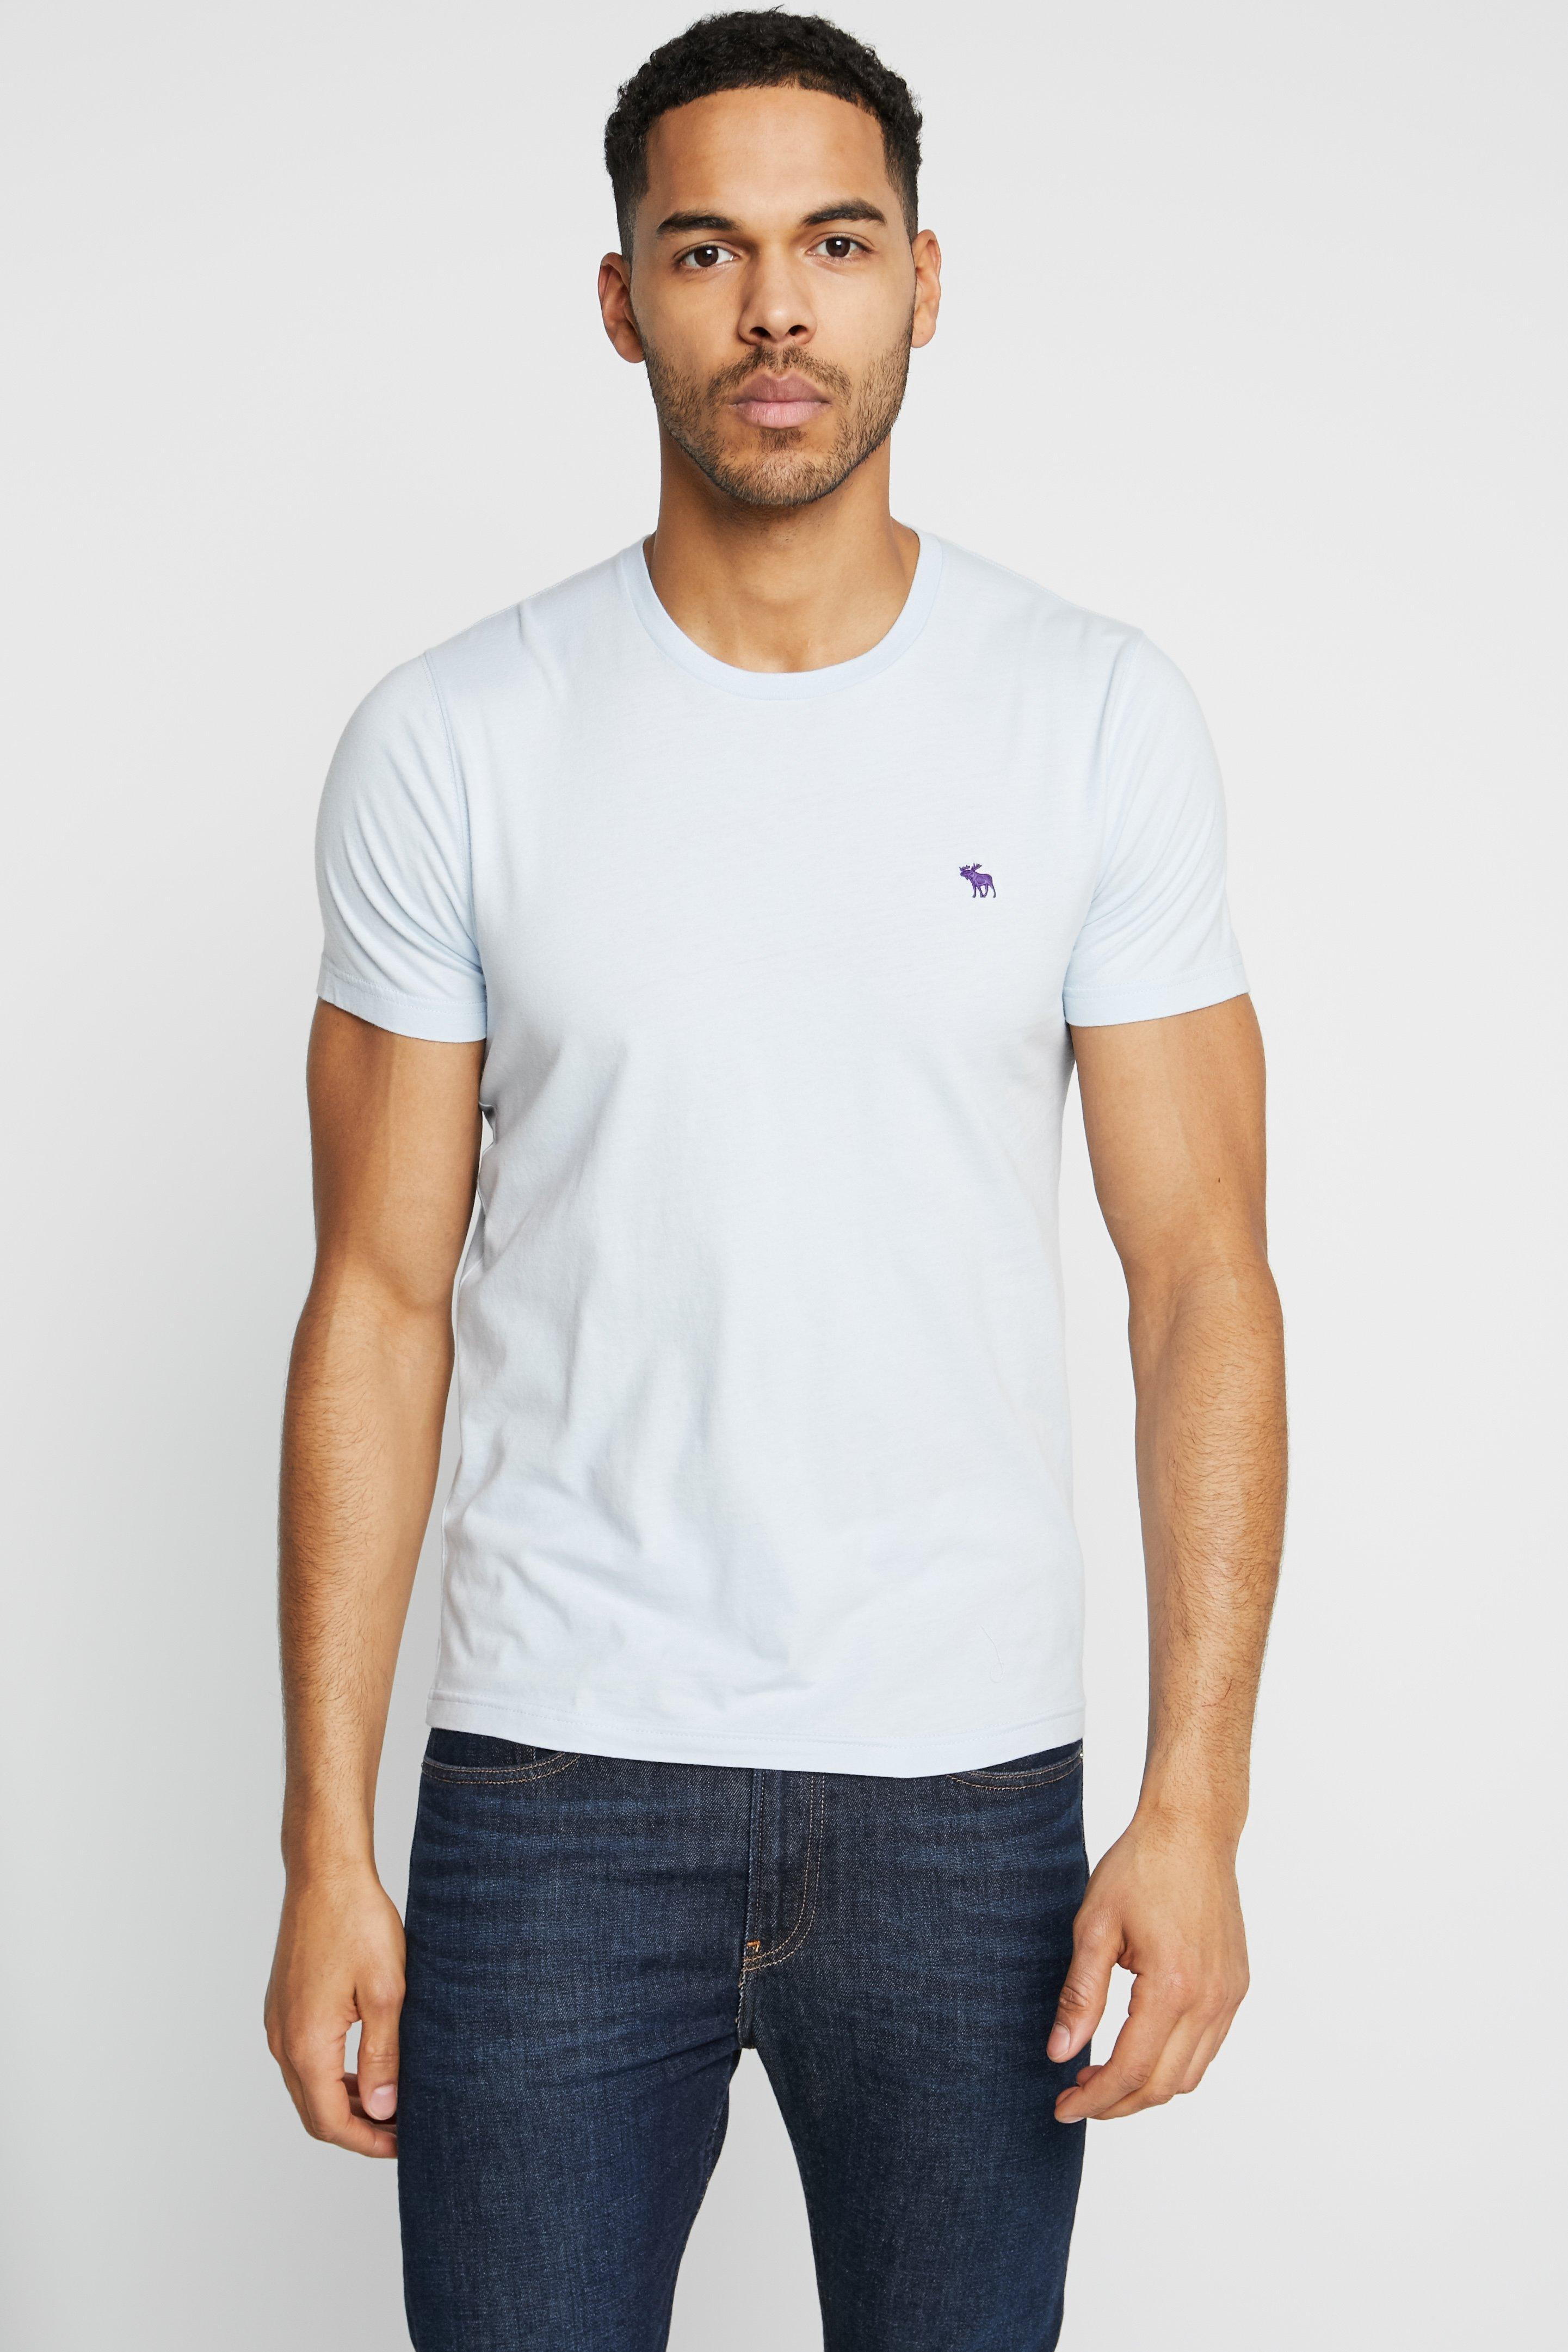 Abercrombie & Fitch Fringe Crew 3 Pack - T-shirt Basic Black/light Blue/dark Blue